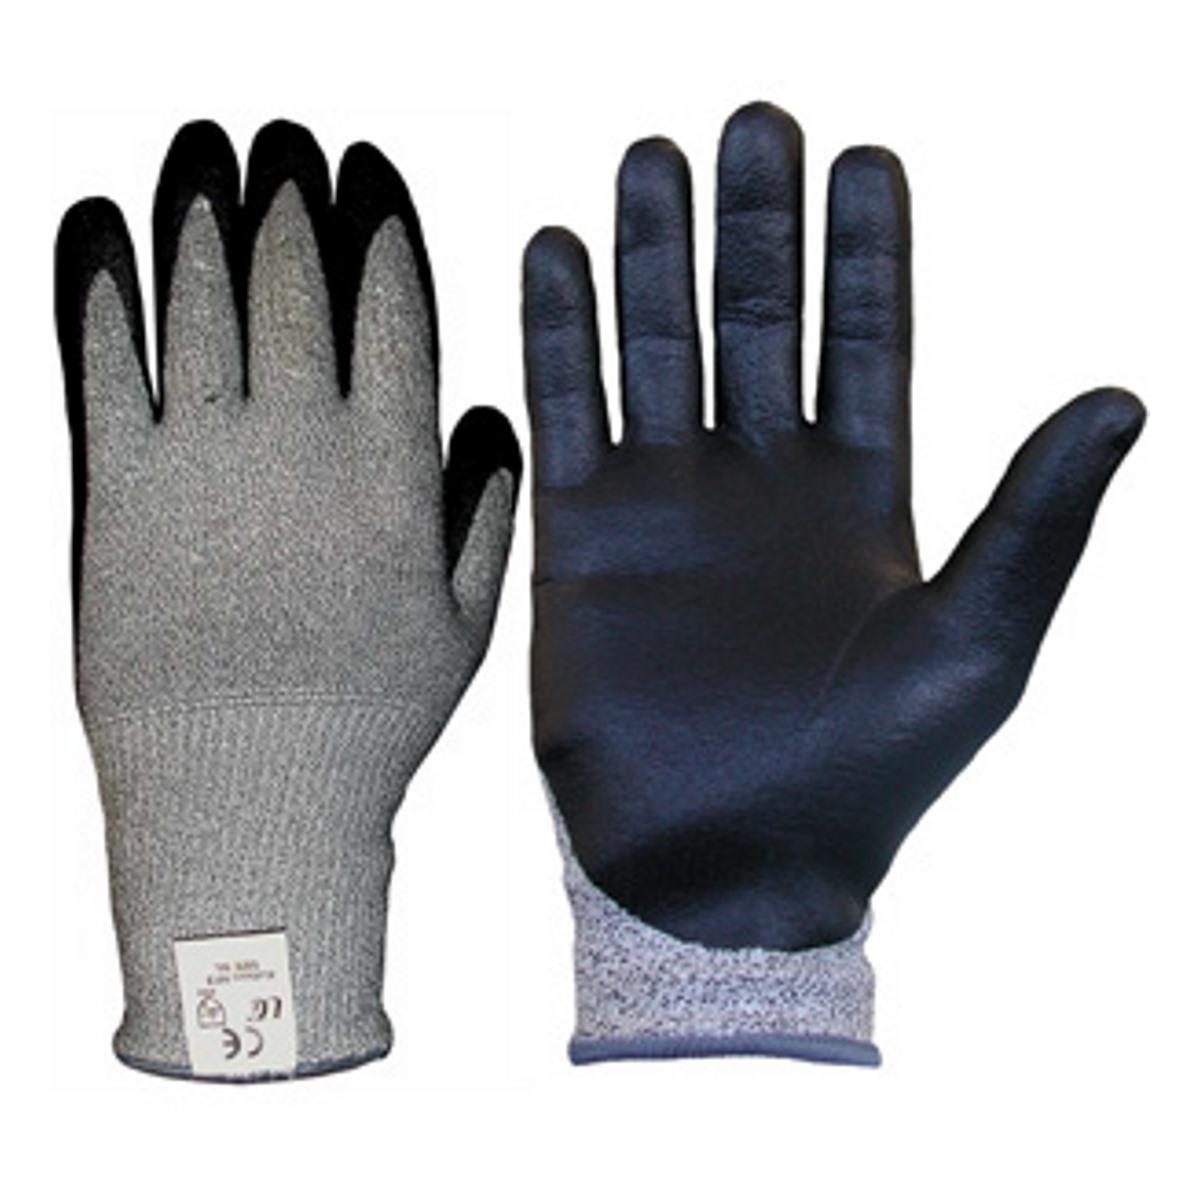 Kutlas Black Cut Level 5 Gloves